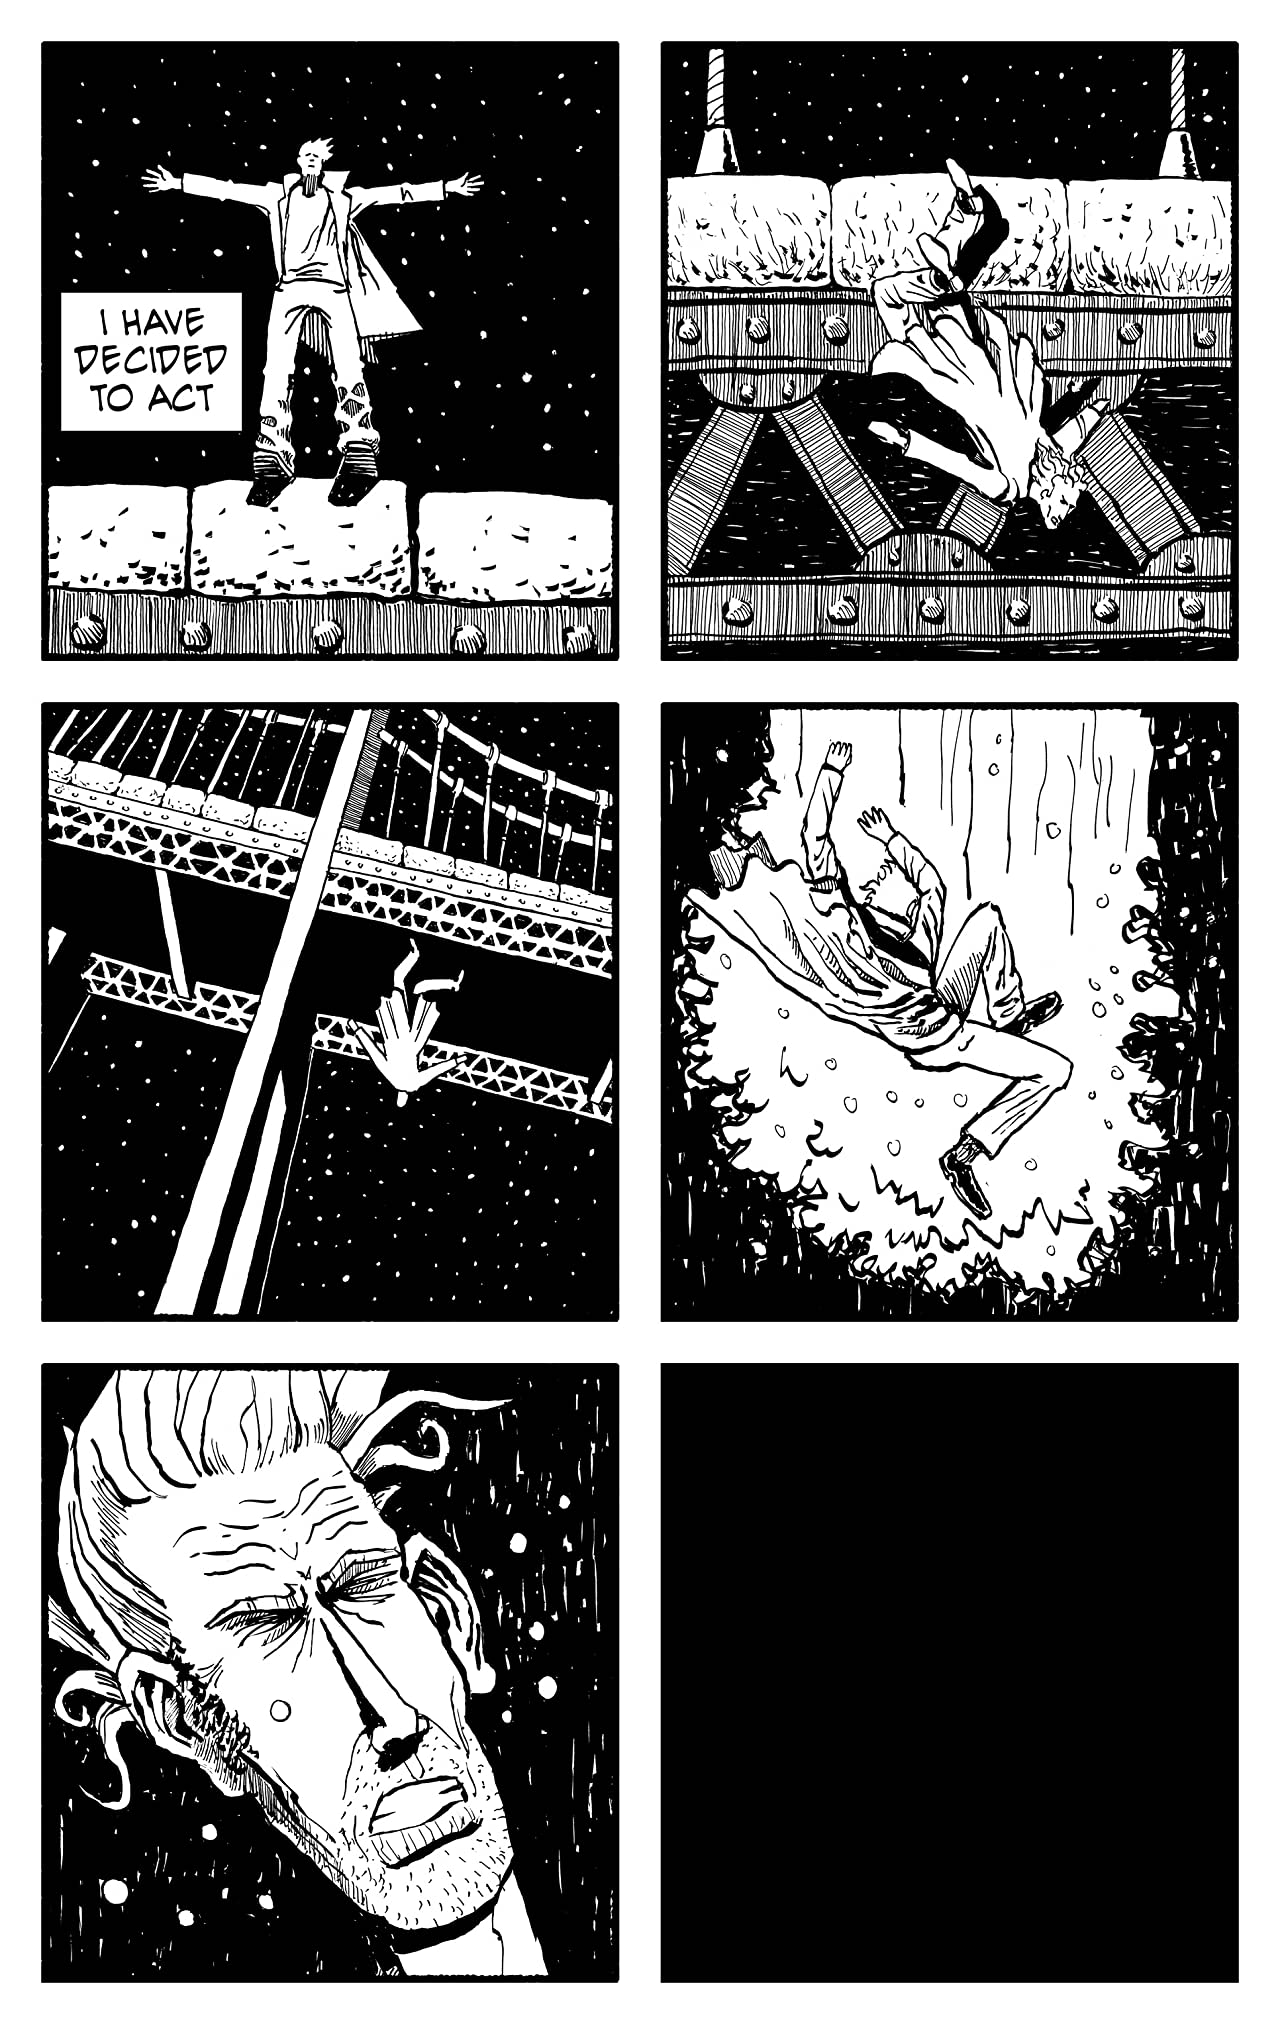 The Nowhere Man #1